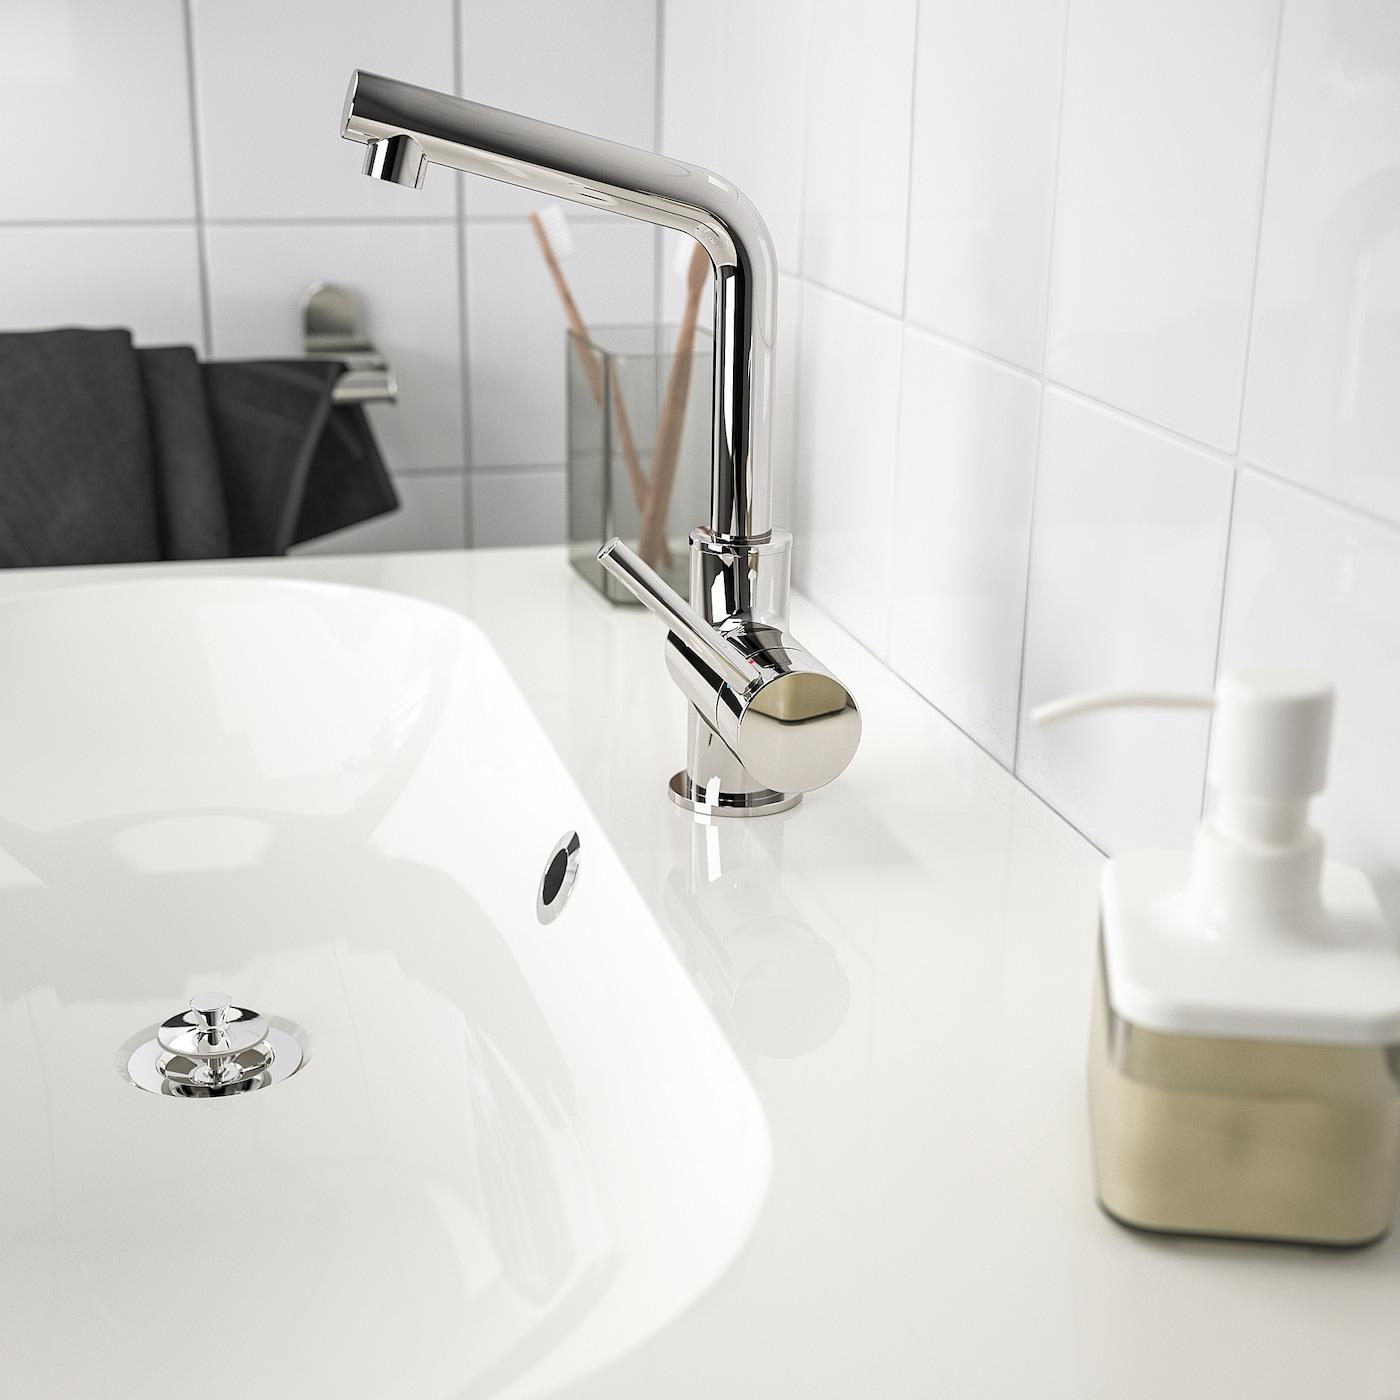 LUNDSKÄR 伦斯卡 洗脸池水龙头,带过滤器, 镀铬